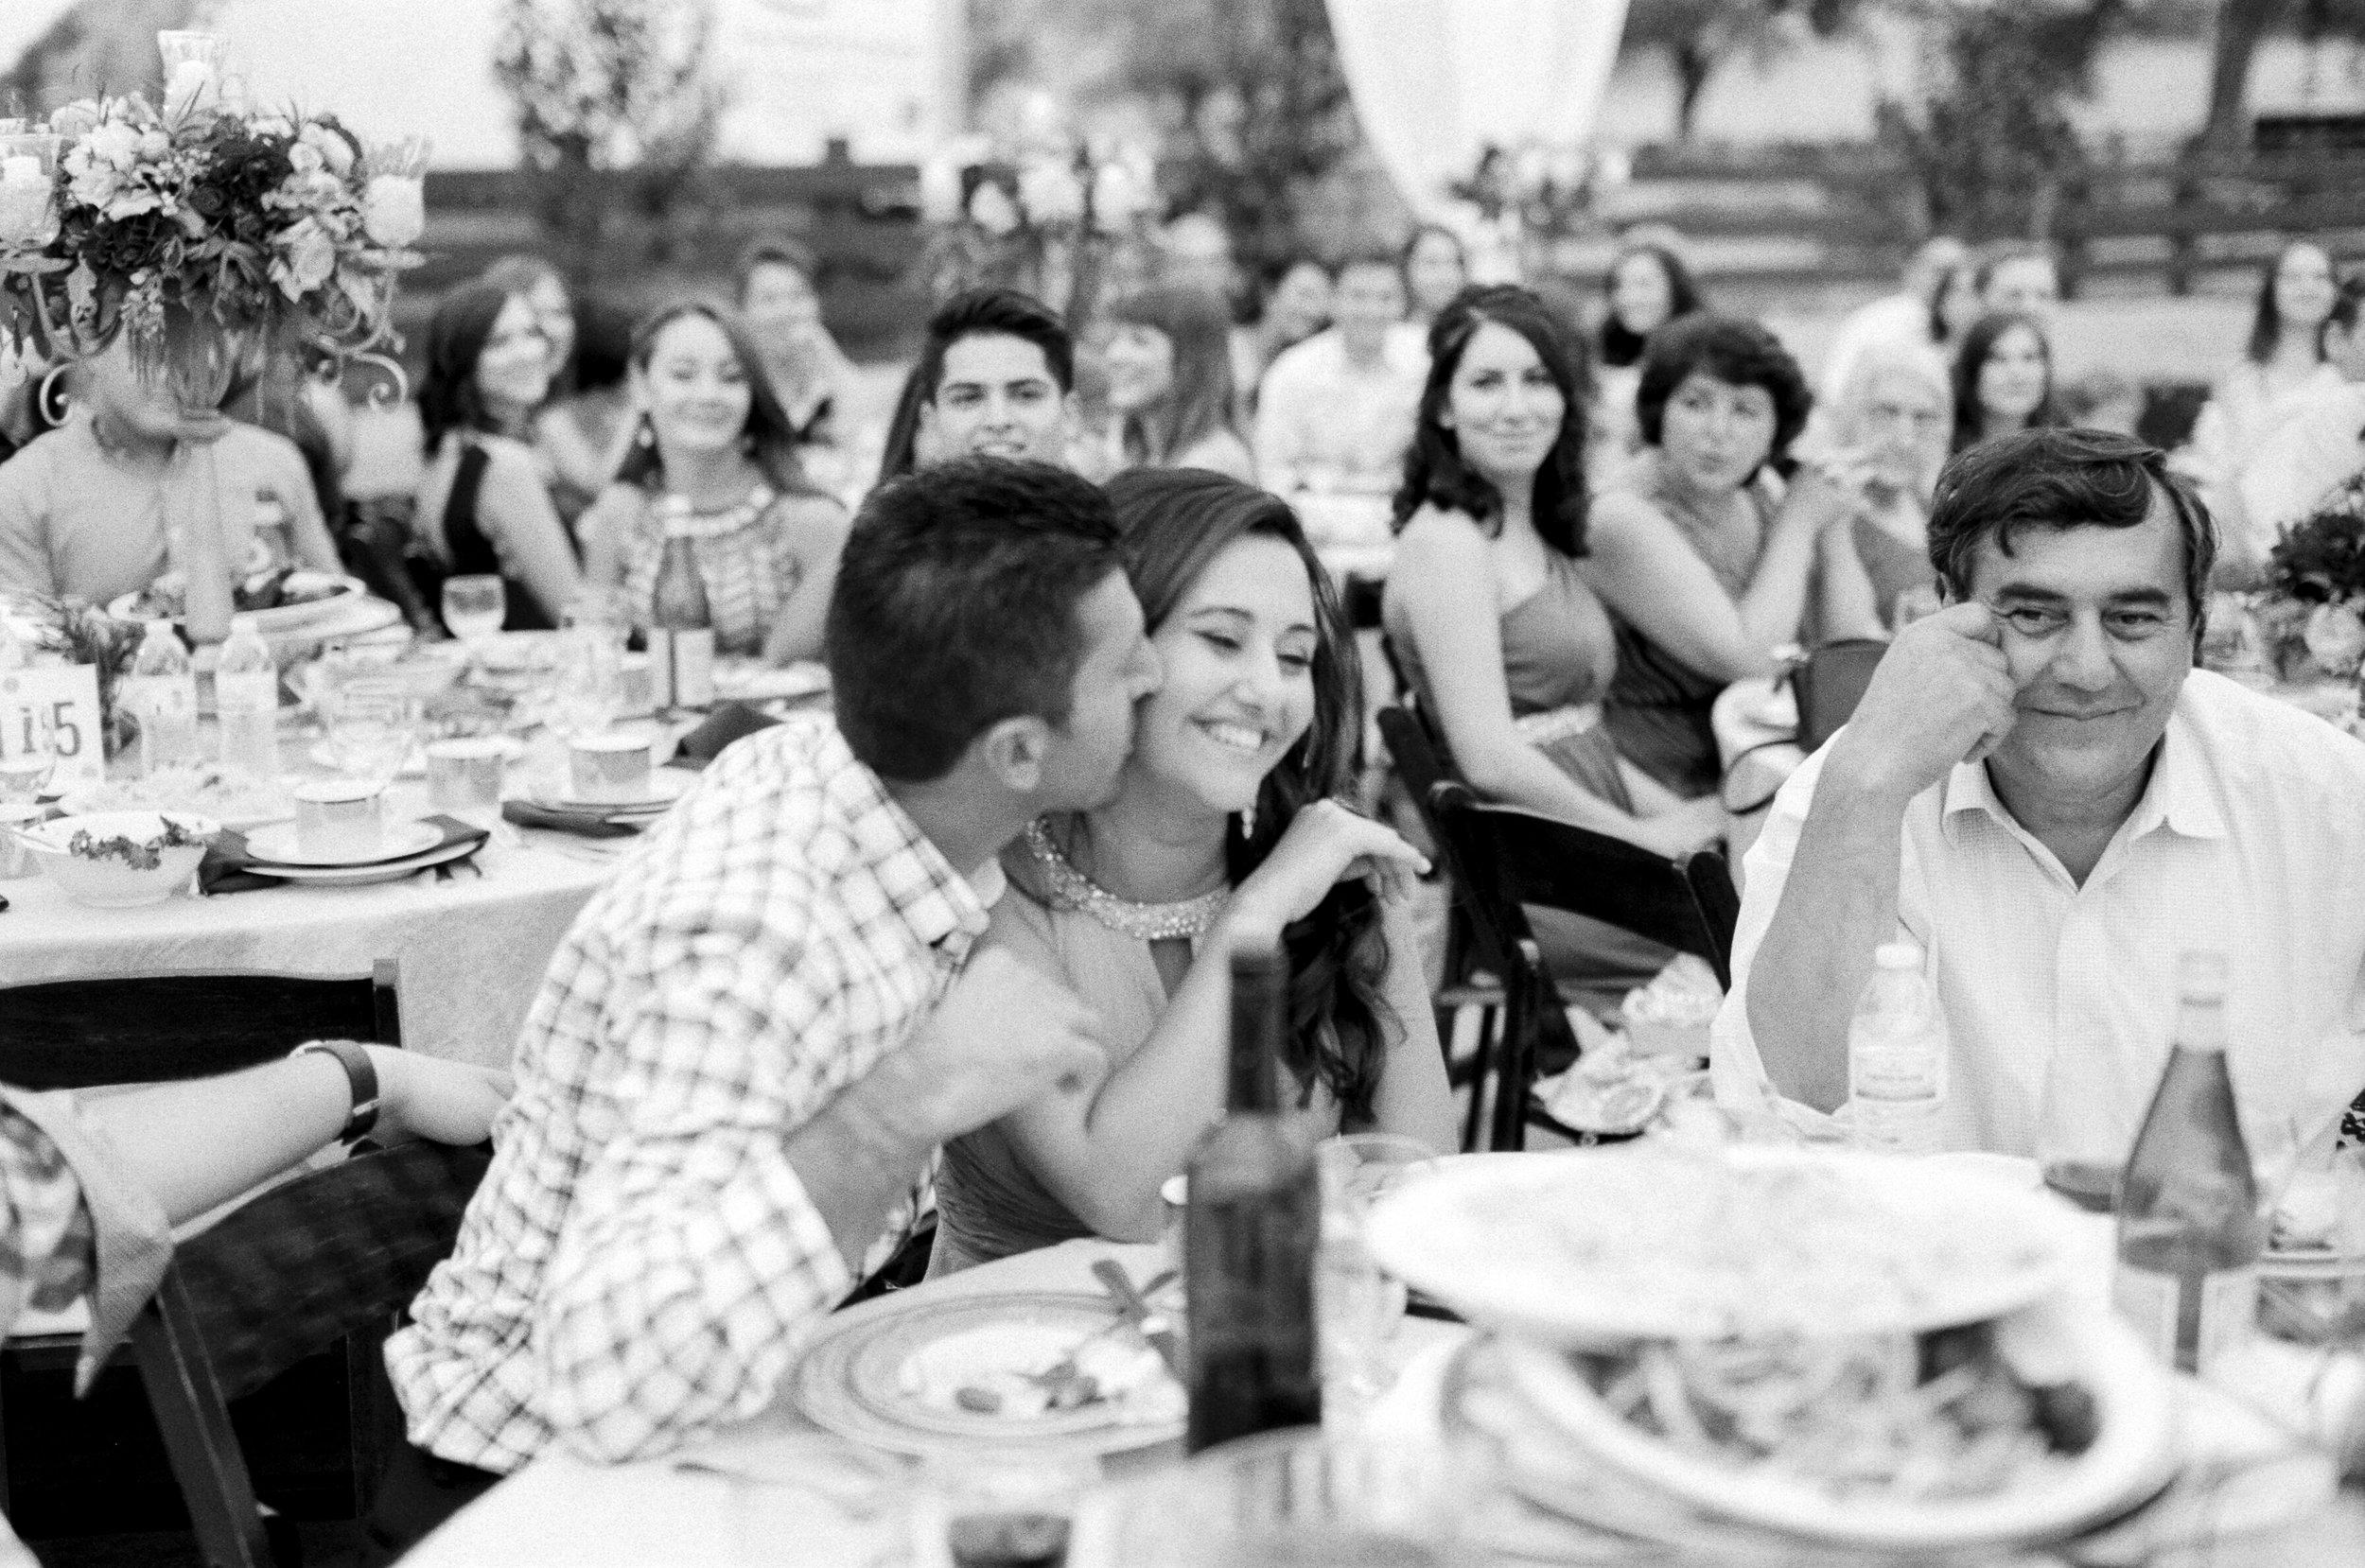 Amador_County_Wedding_Reception_Guests_Black_White_Rancho_Victoria_Vineyard_Northern_California.jpg